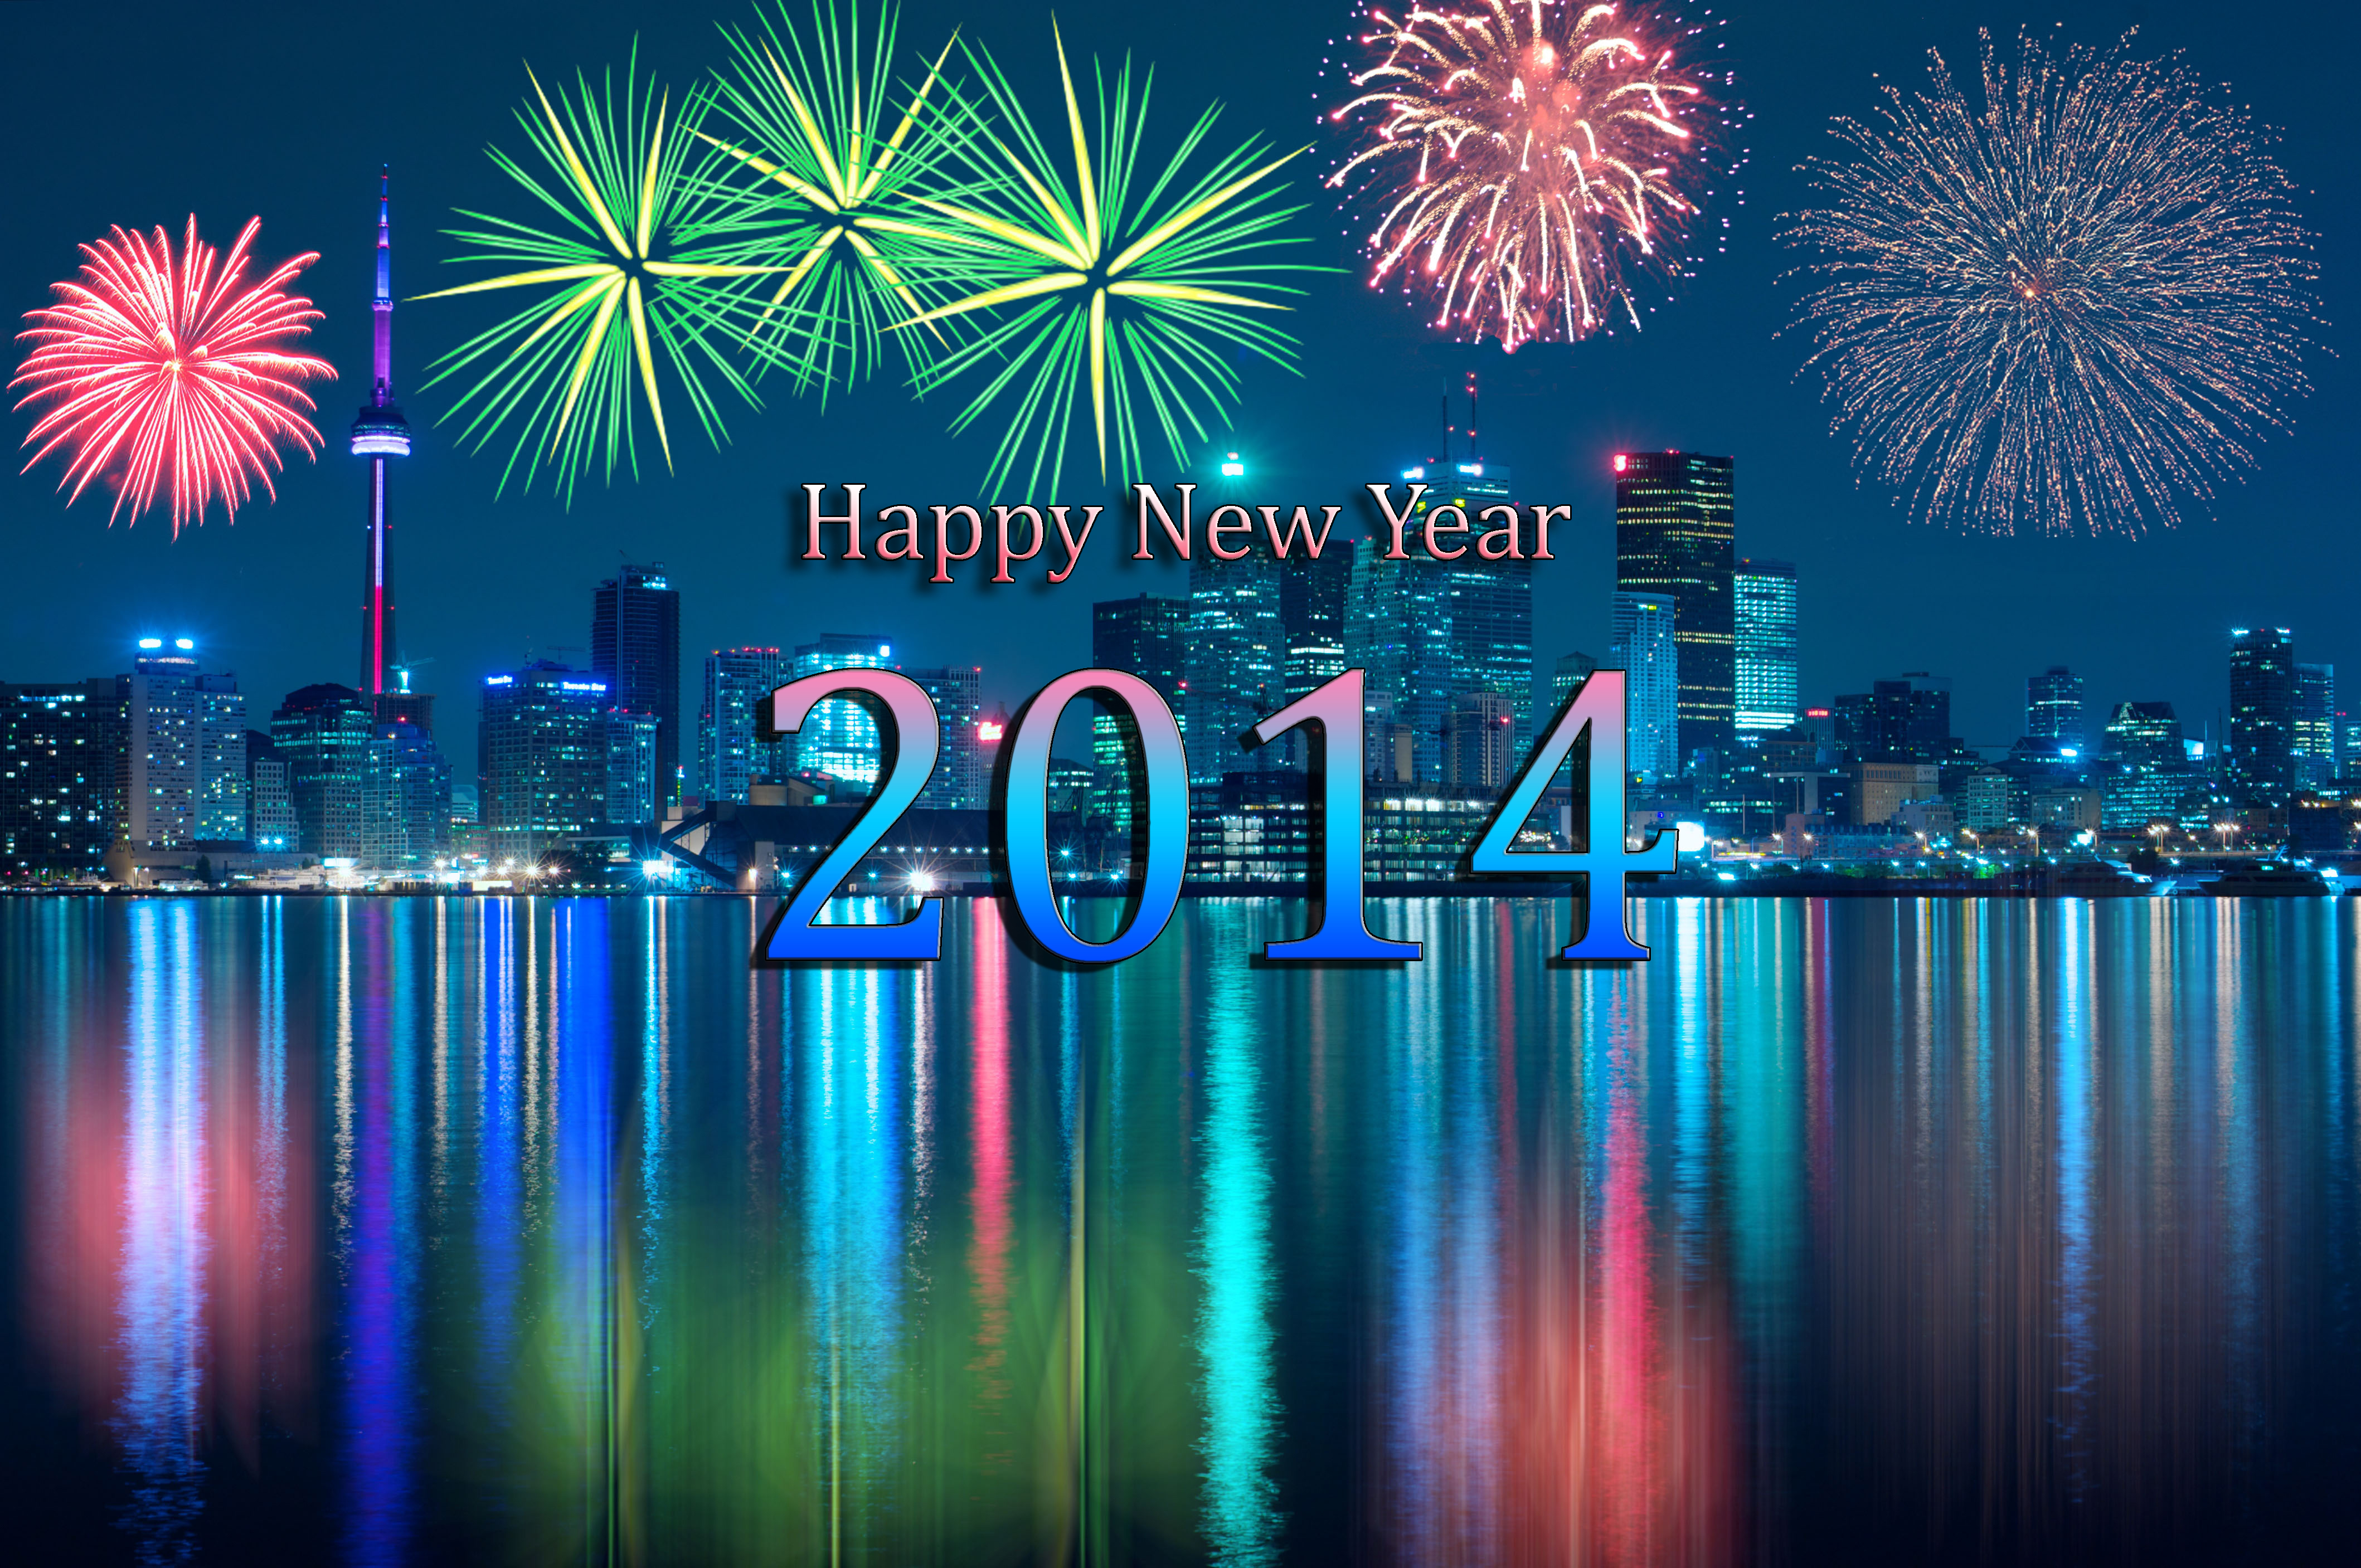 Happy New Year 2014!!! | The Big Data Institute